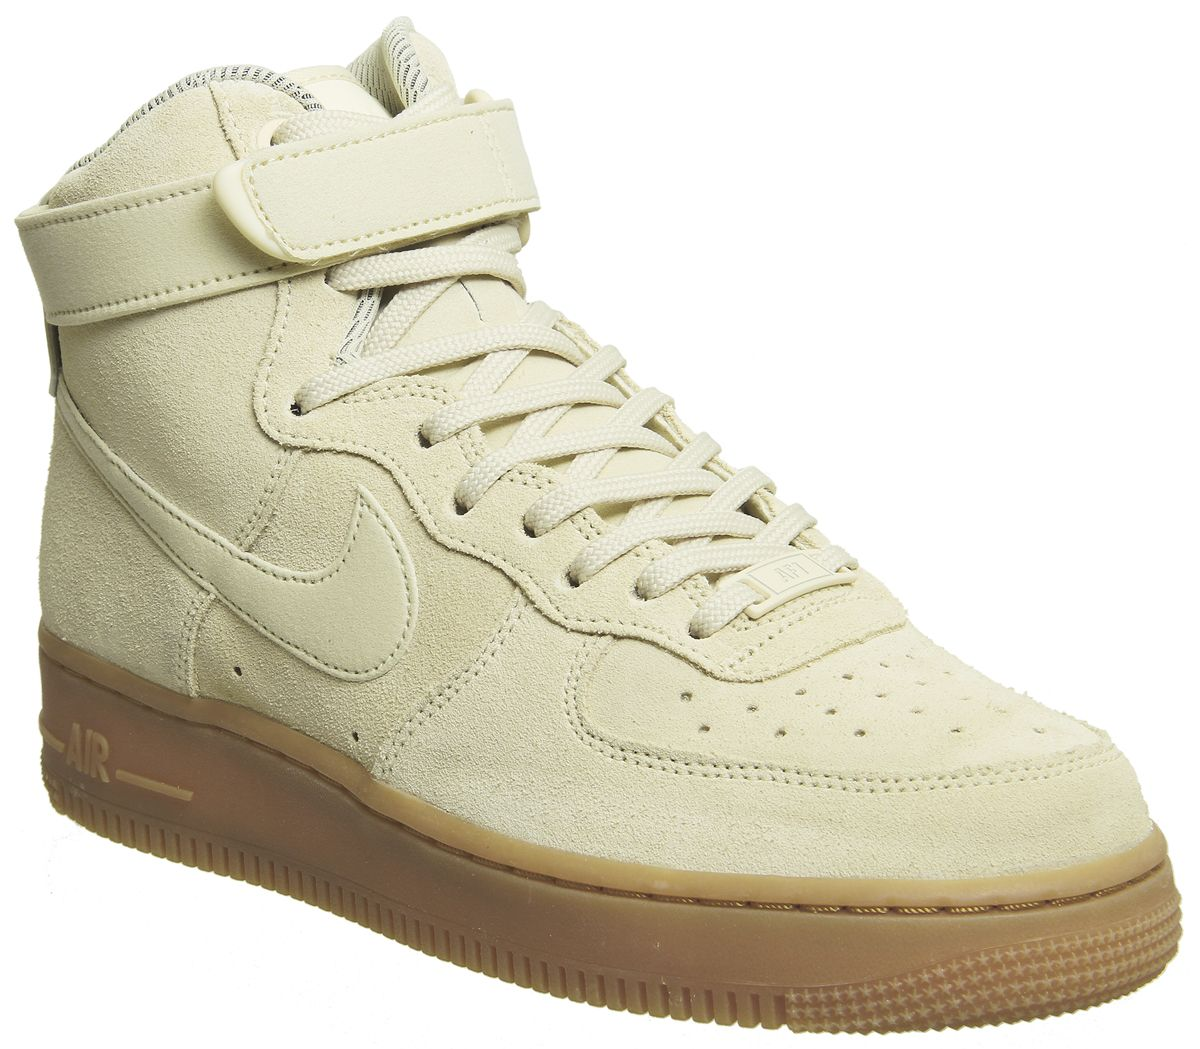 quality design 66246 84c0f Nike Air Force 1 Hi Trainers Muslin Gum - Hers trainers